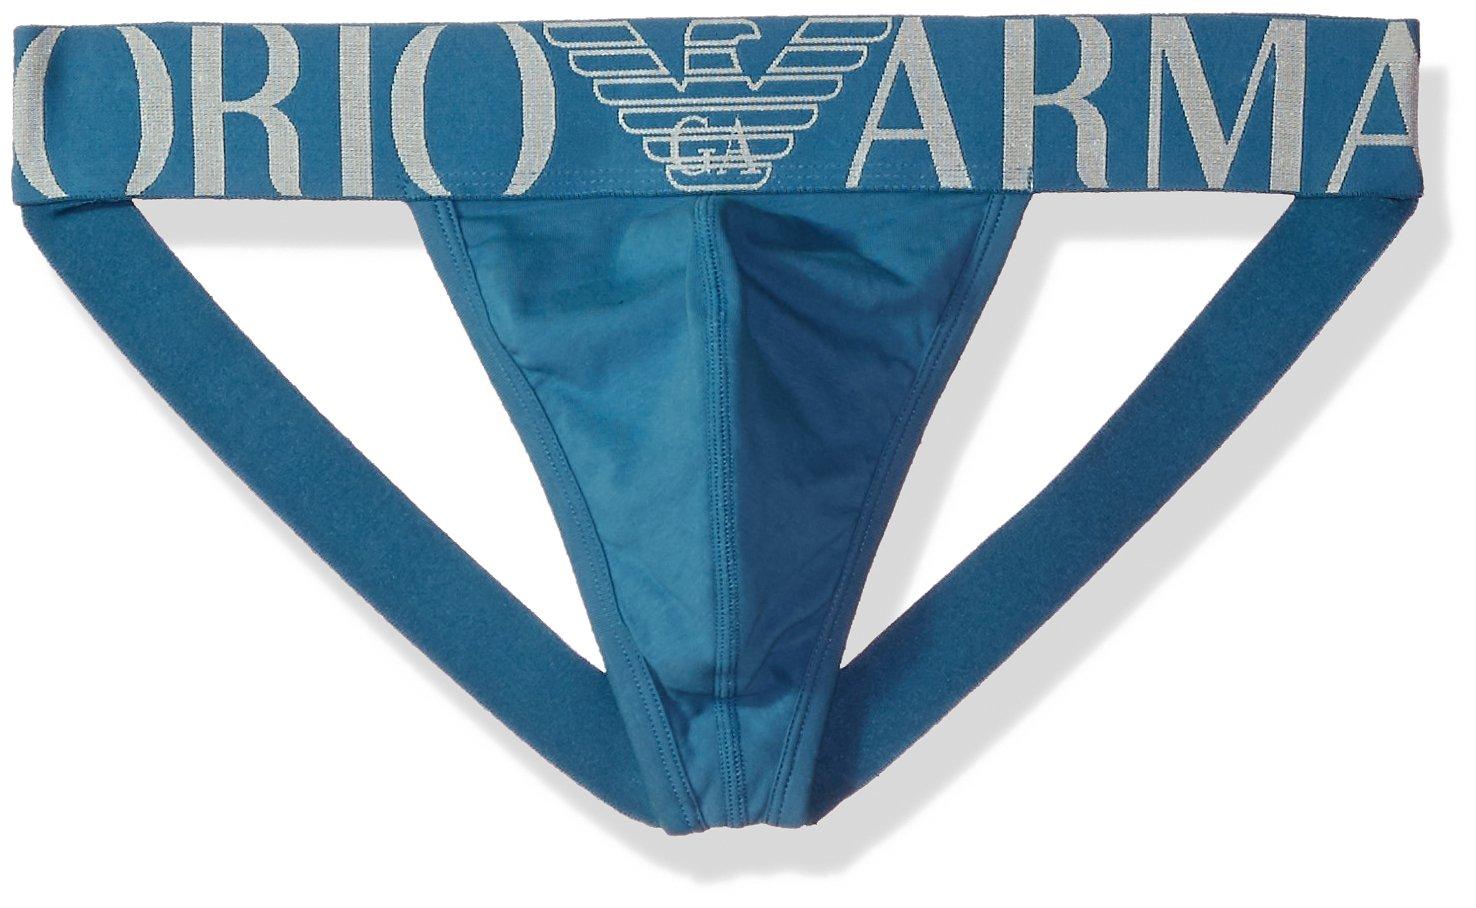 Emporio Armani Men's Stretch Cotton Megalogo Jockstrap, Cadet Blue, XL